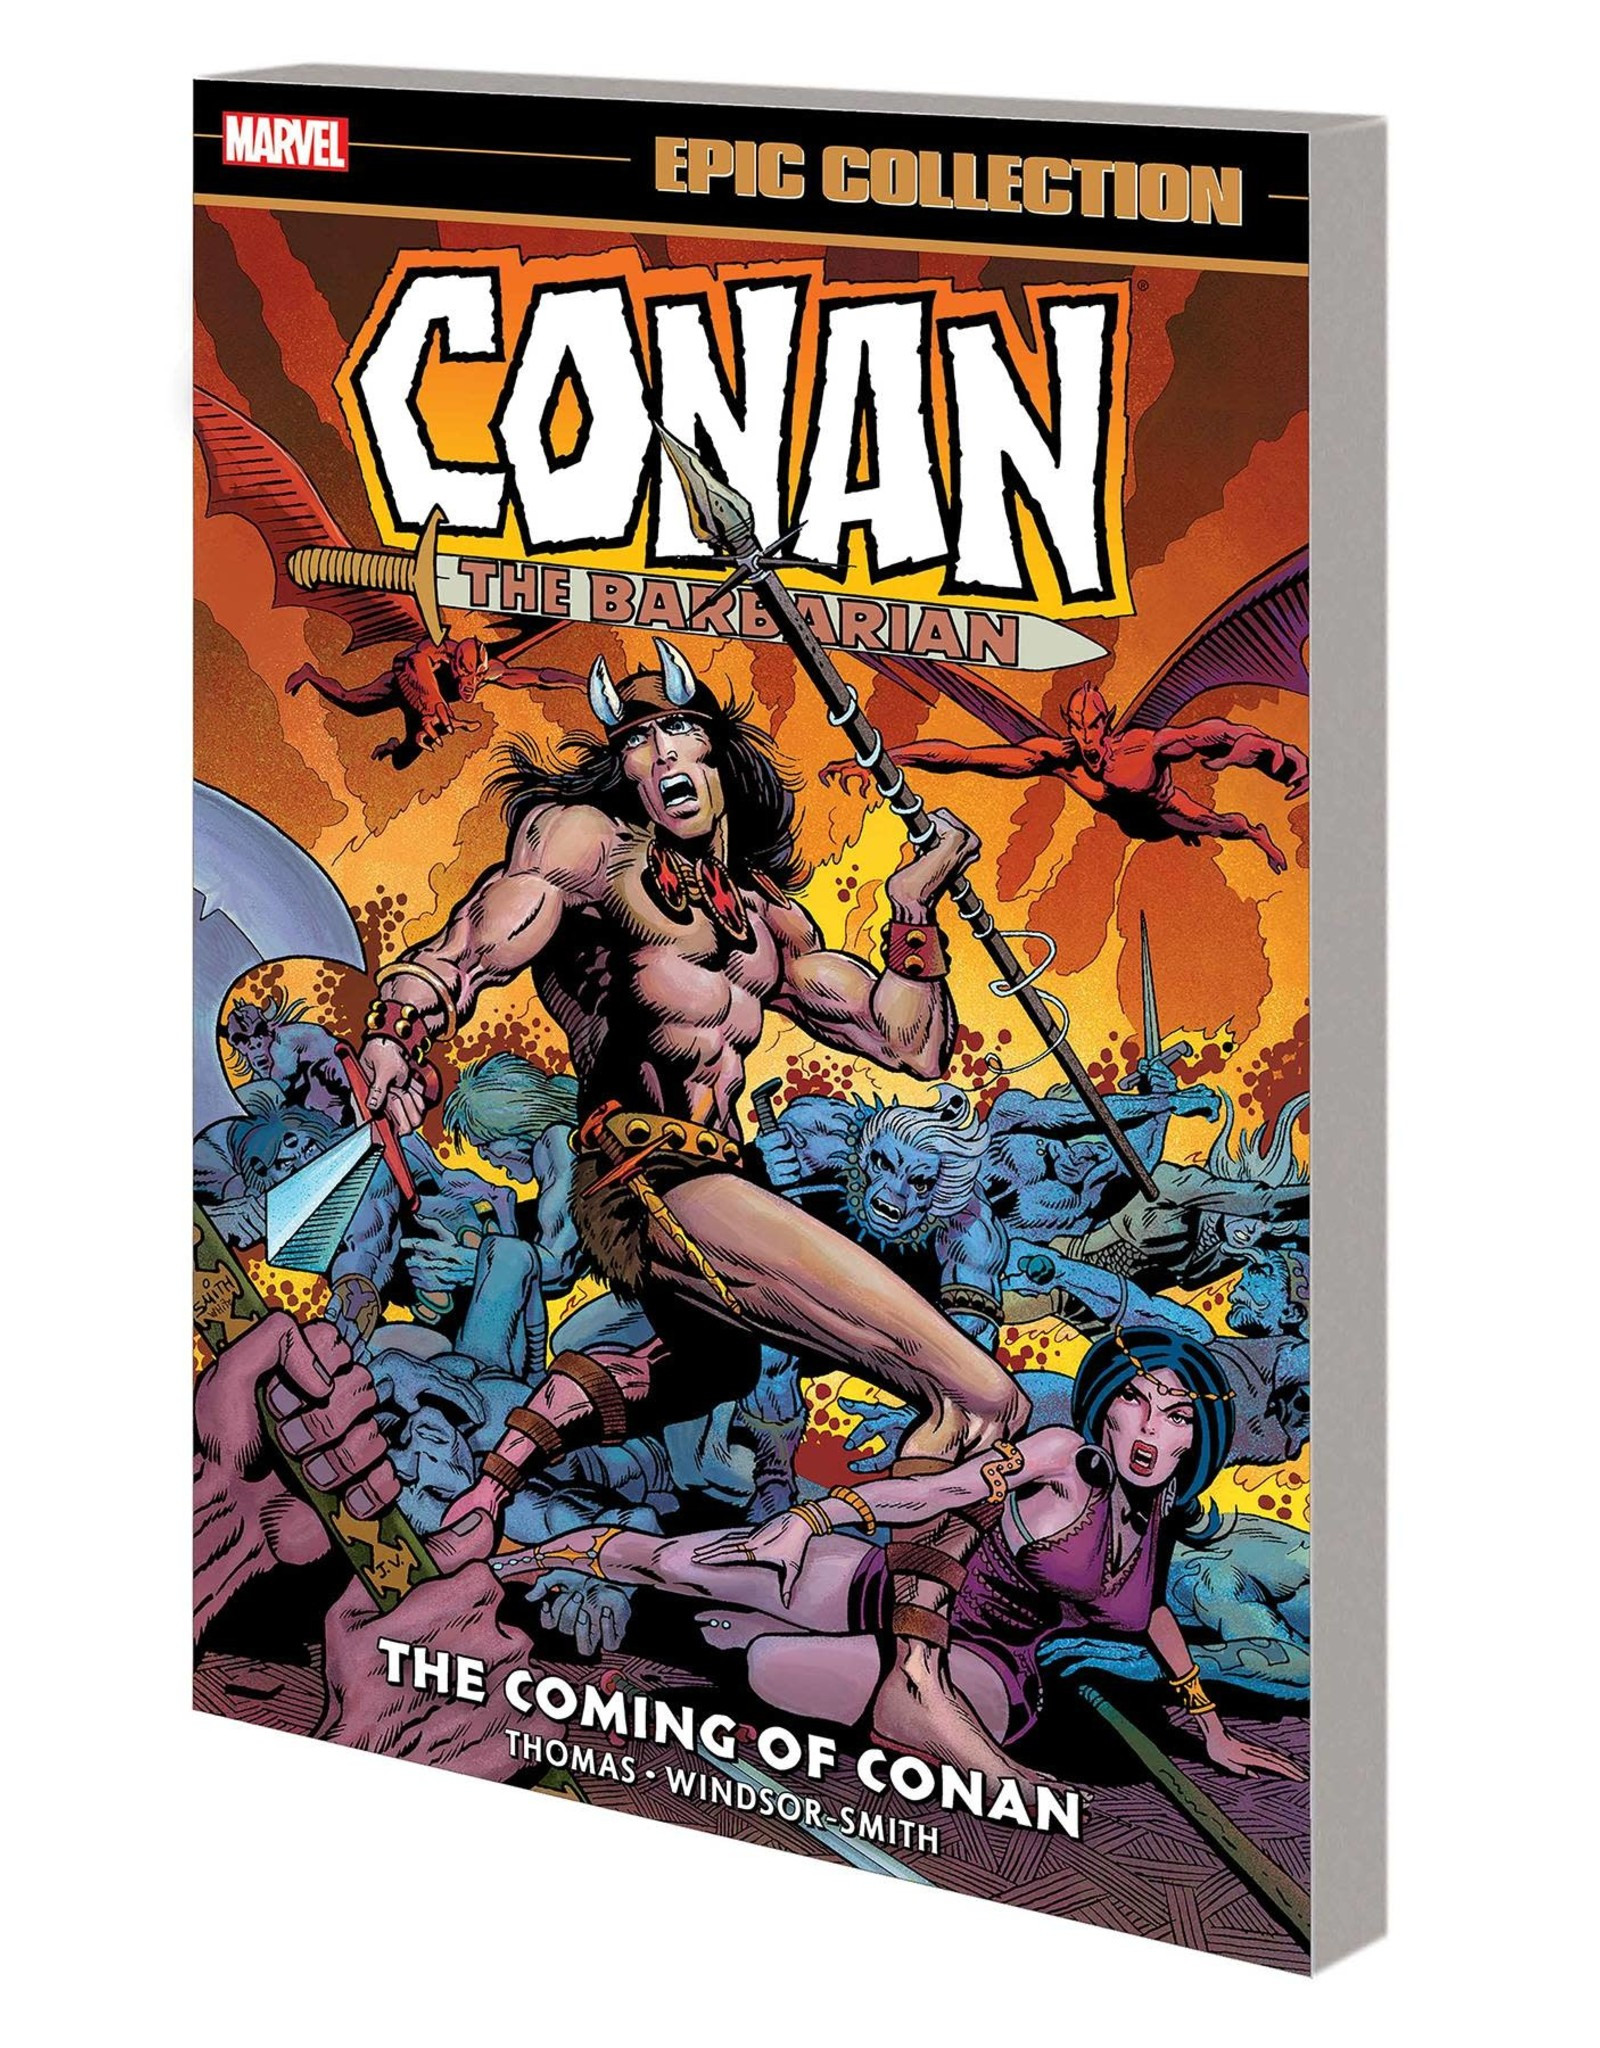 MARVEL COMICS CONAN BARBARIAN ORIGINAL MARVEL YEARS EPIC COLLECTION TP COMING OF CONAN